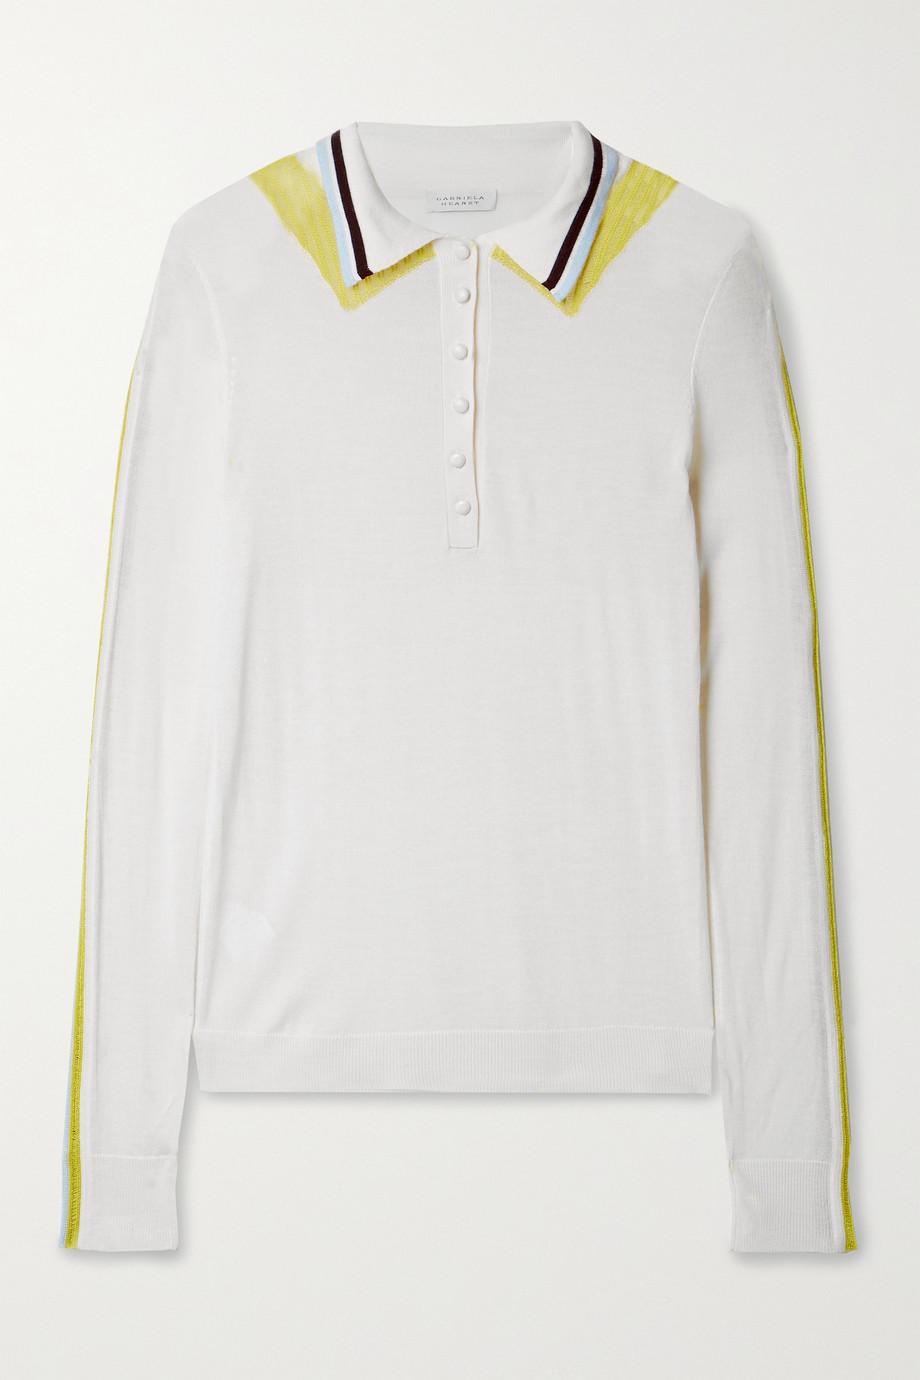 Gabriela Hearst Manuel striped cashmere and silk-blend sweater